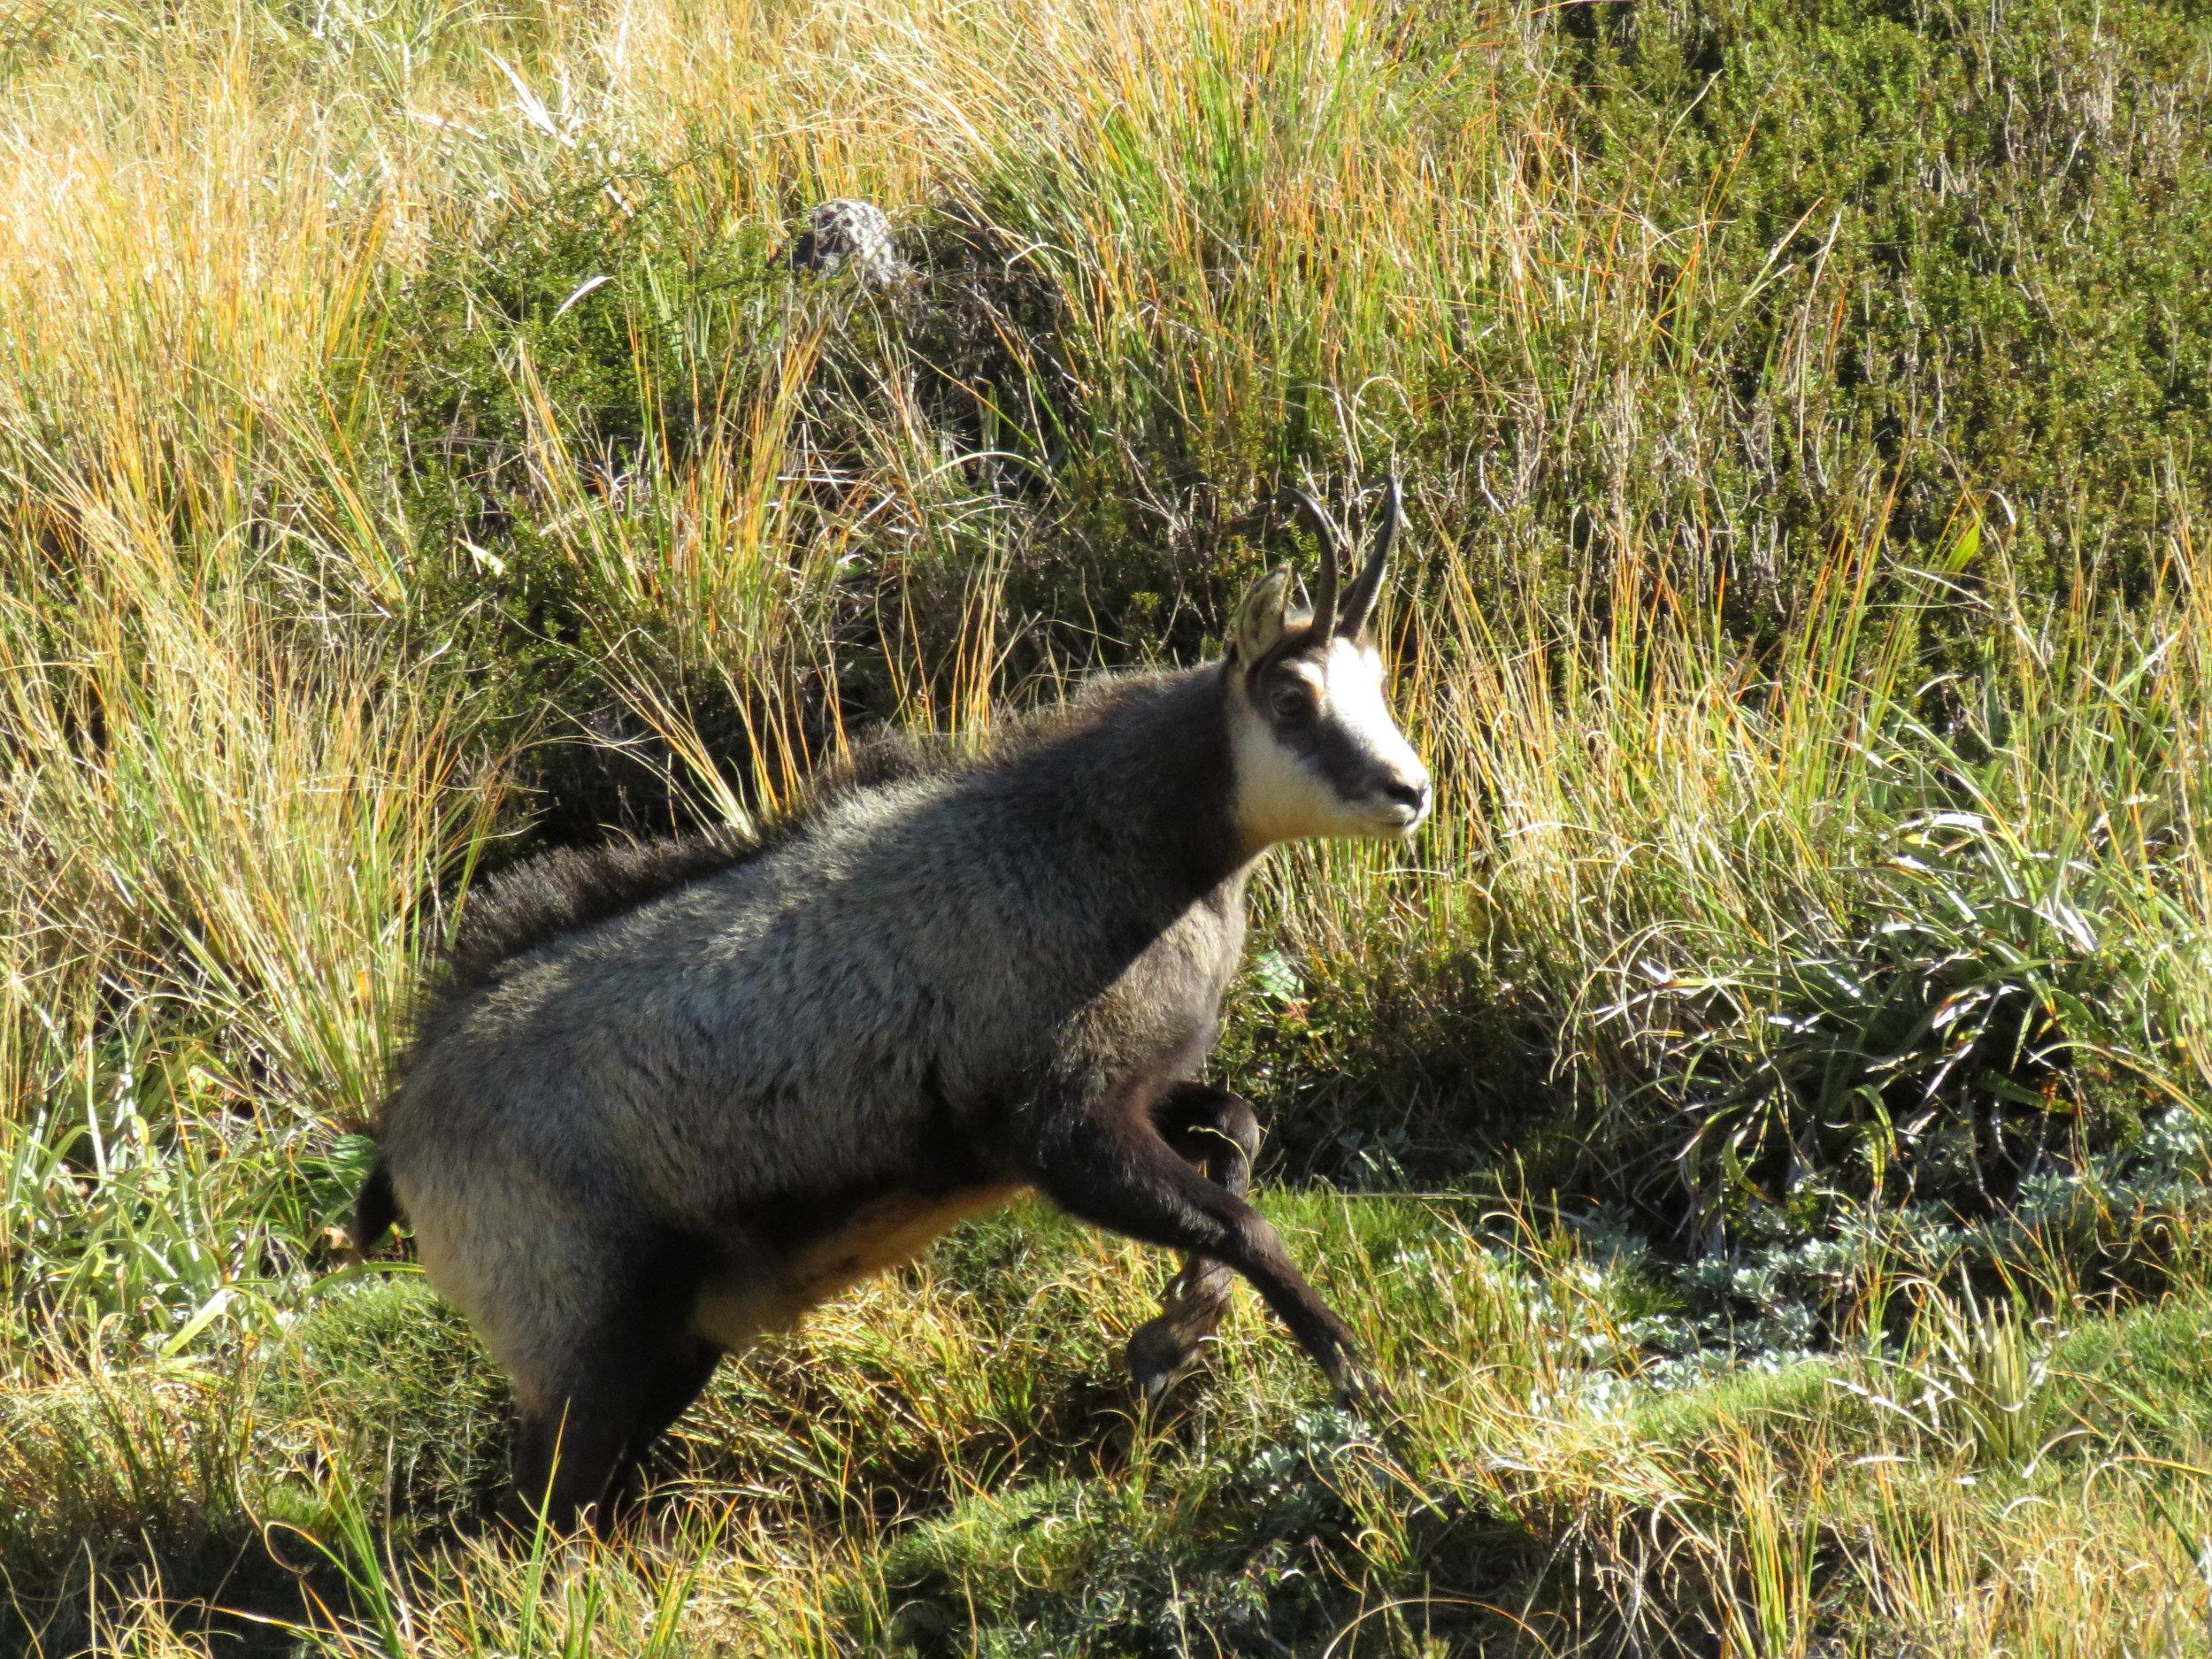 A big bodied doe. Image @ Shaun Monk